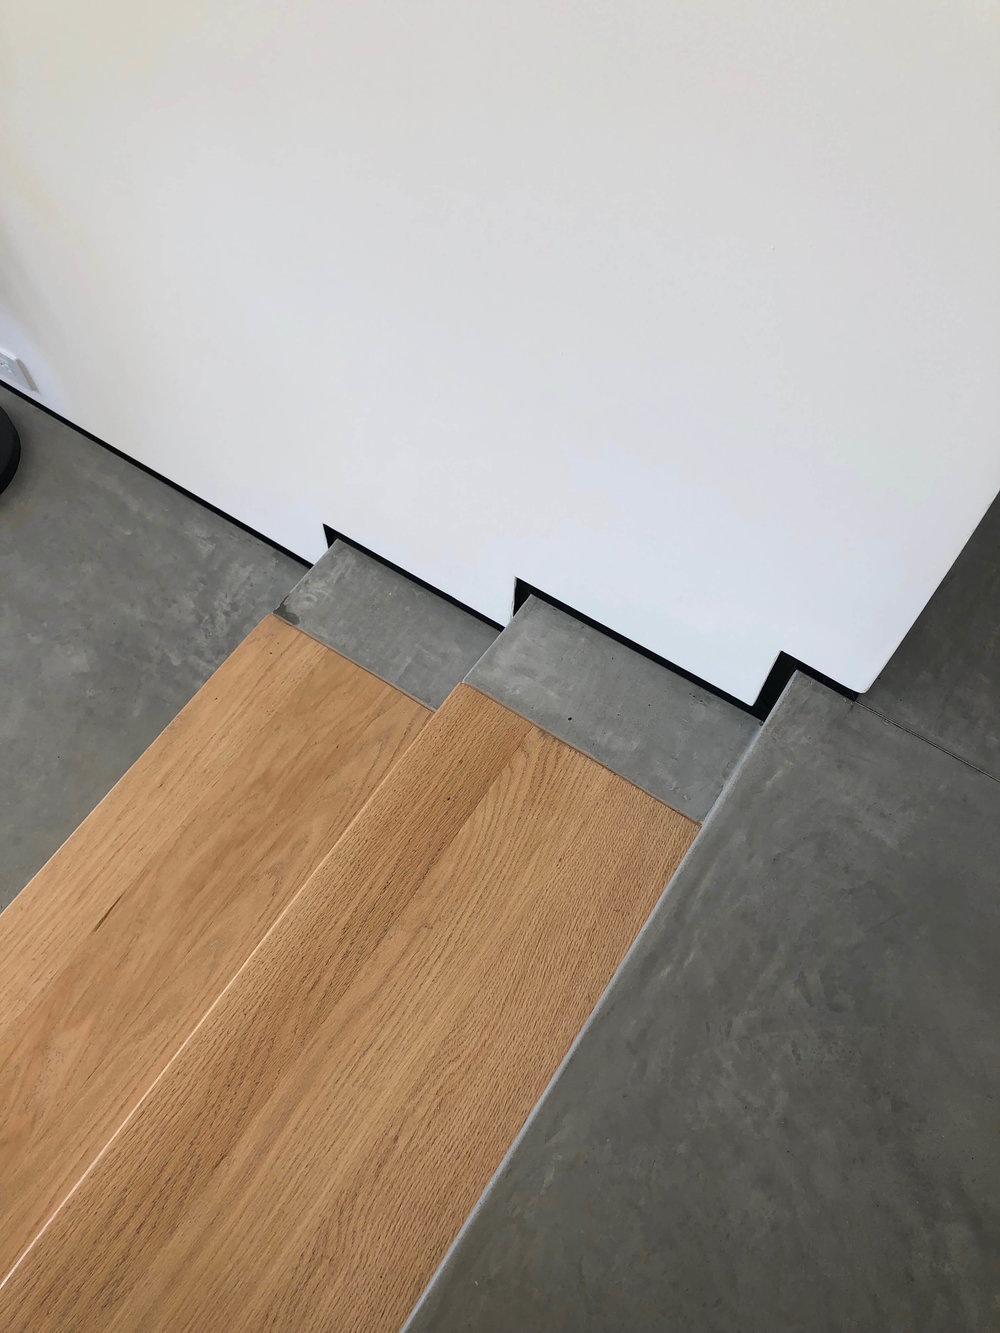 California contemporary design - Dwell on Design's Fall Home Tour, Designer: Vitus Matare #stairs #concretefloors